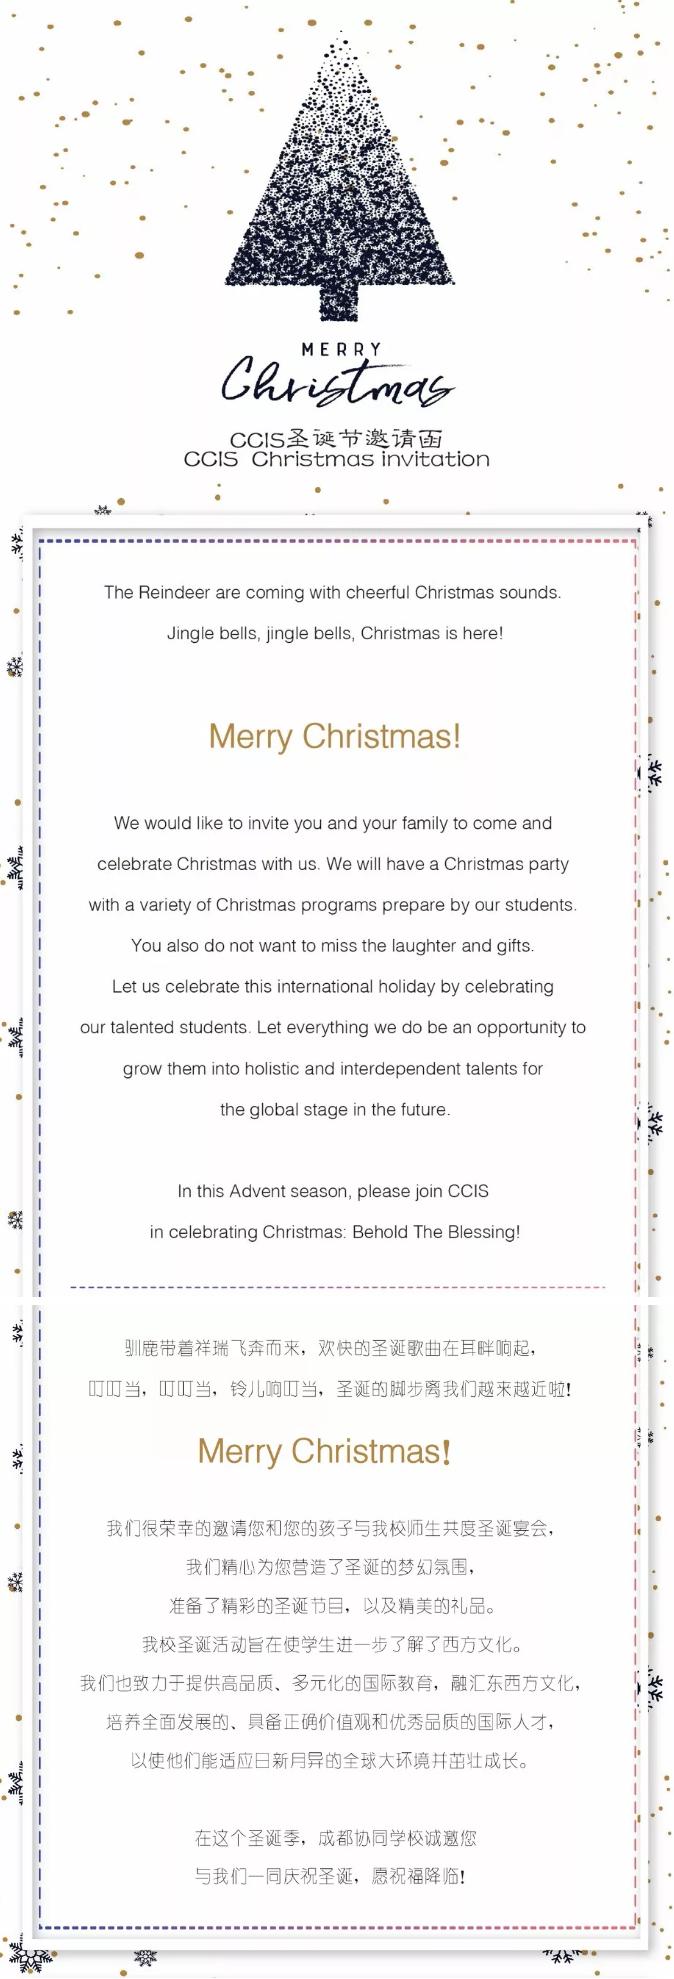 CCIS-圣诞节邀请函-_-CCIS-Christmas-invitation_03